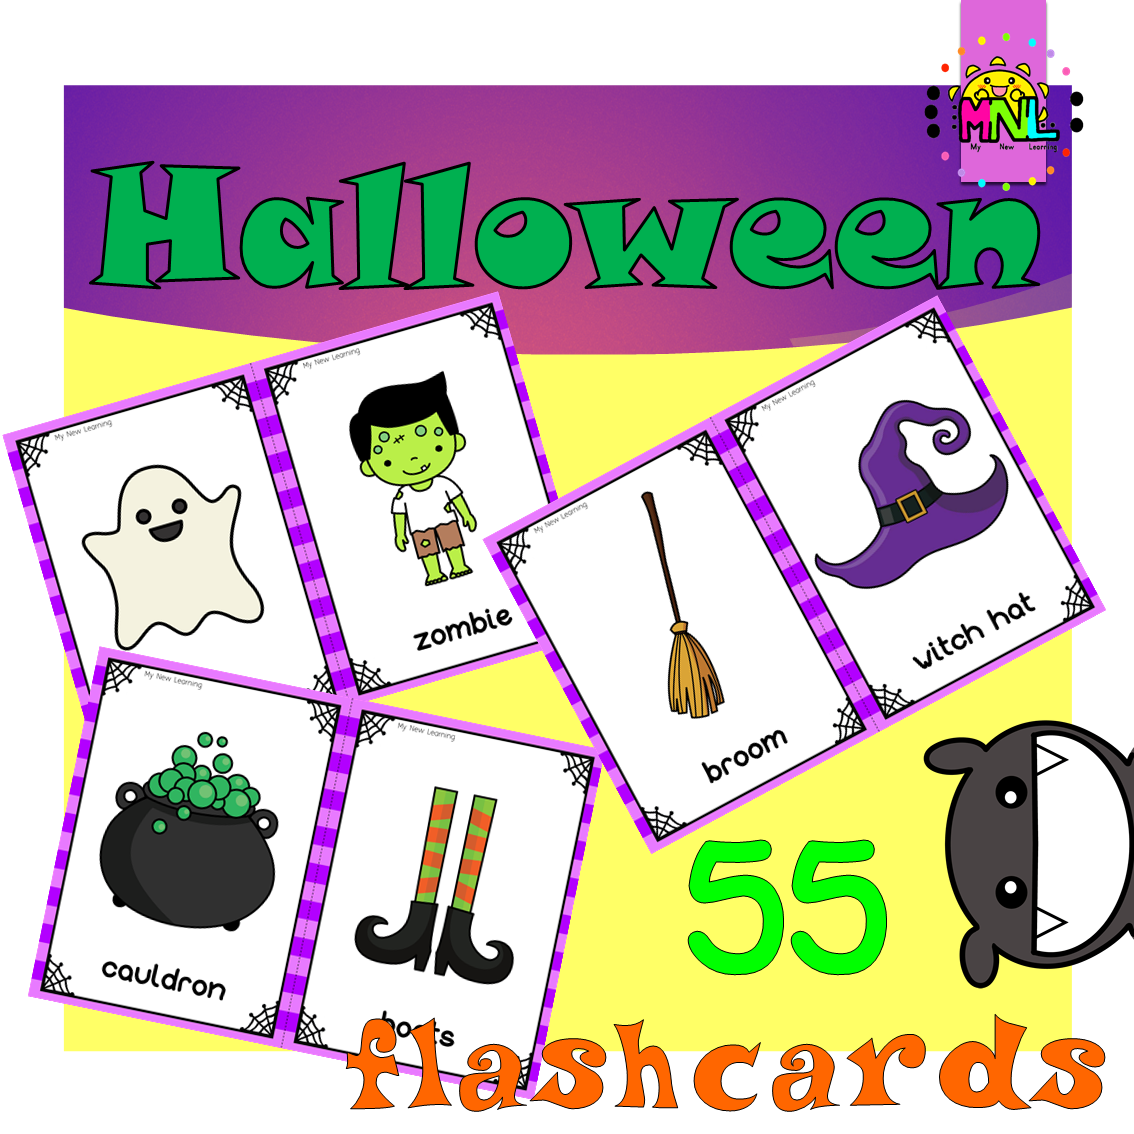 Pin on Halloween School Resources